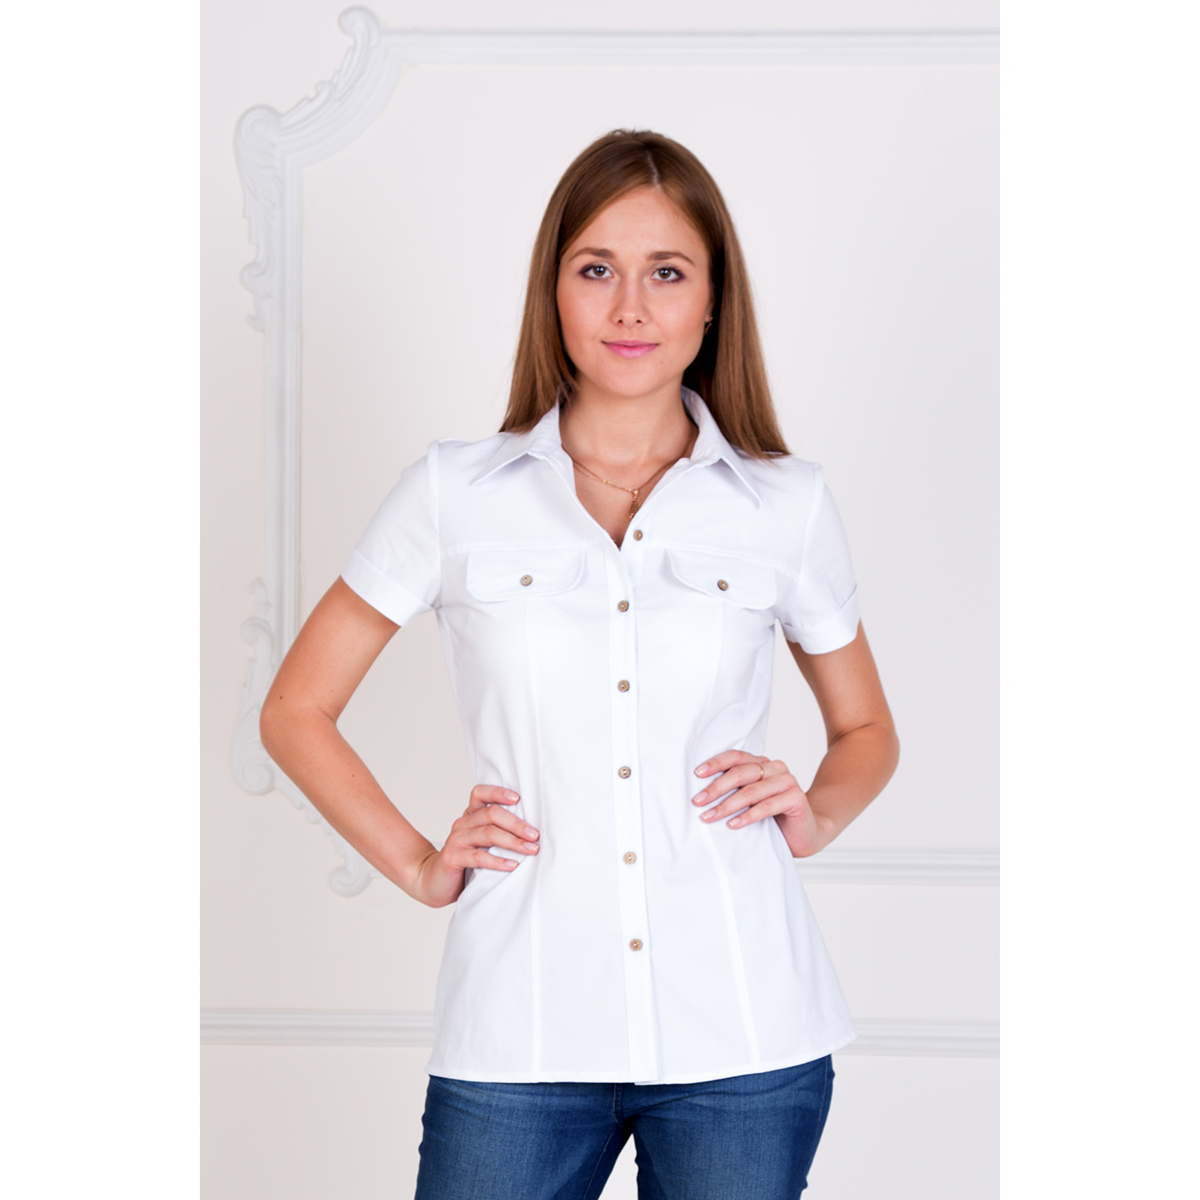 Женская рубашка Александра Белый, размер 40Блузки, майки, кофты<br>Обхват груди:80 см<br>Обхват талии:62 см<br>Обхват бедер:88 см<br>Рост:167 см<br><br>Тип: Жен. рубашка<br>Размер: 40<br>Материал: Хлопок